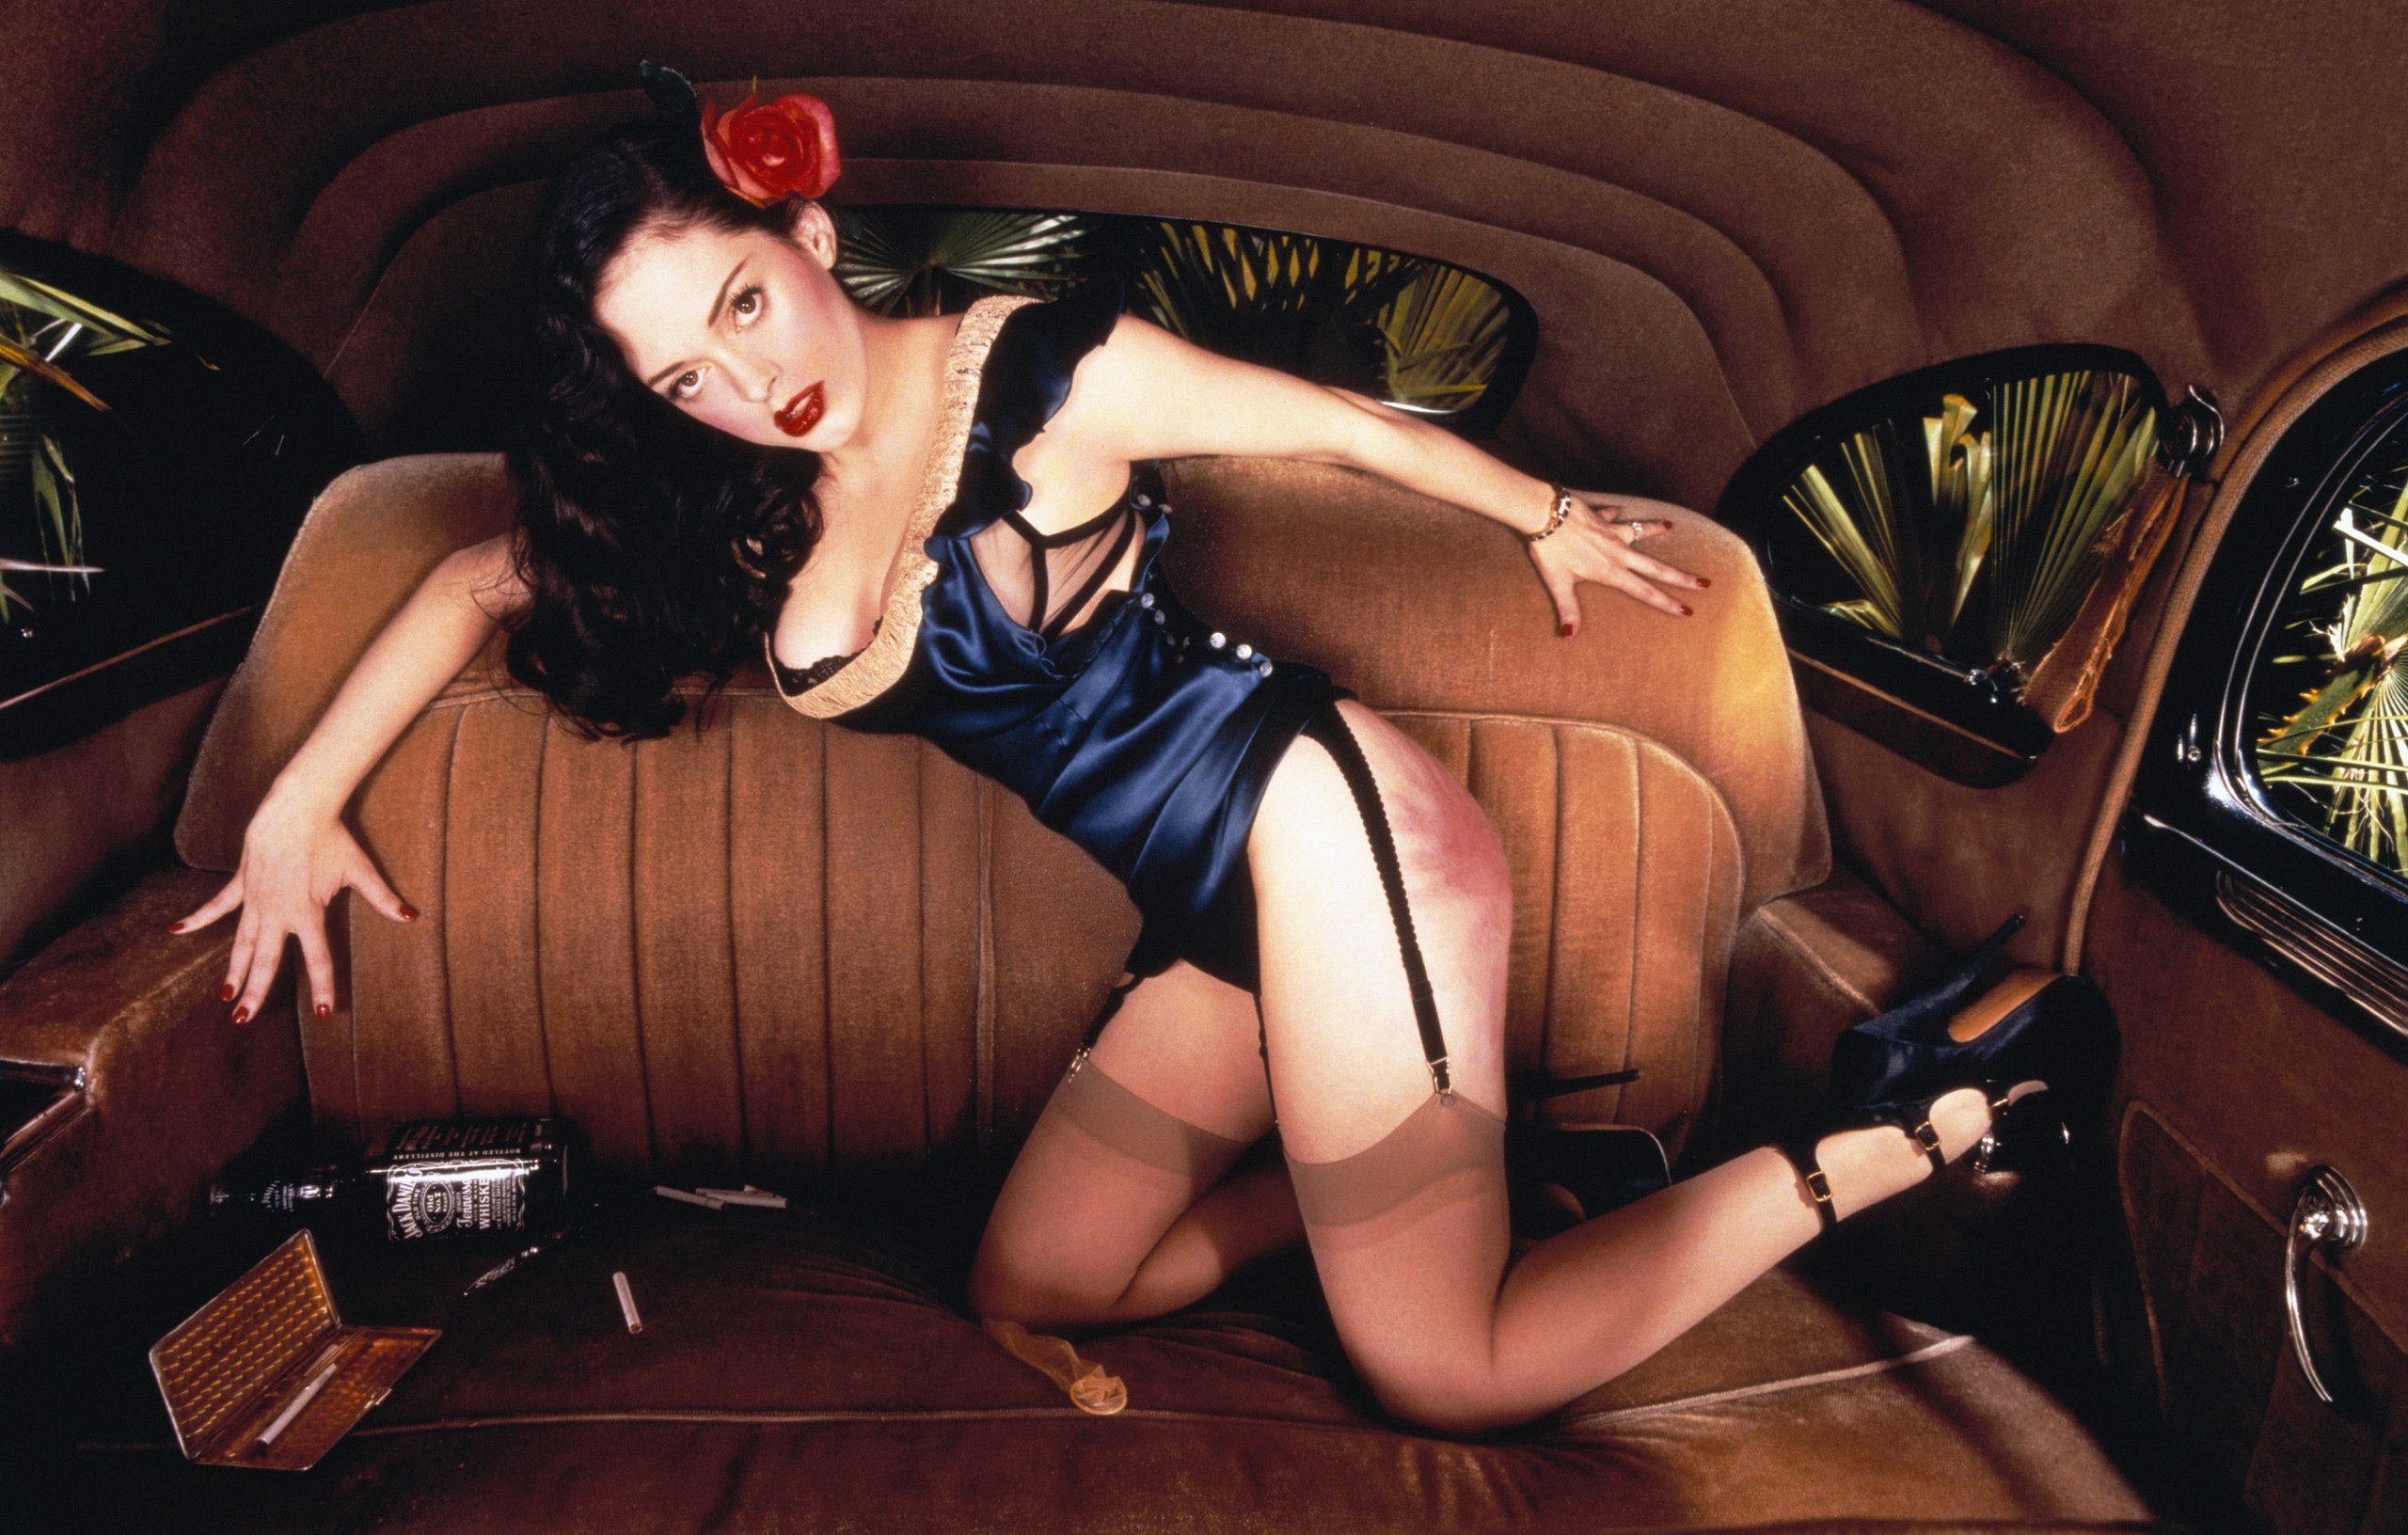 Роуз макгоуэн секс 18 фотография